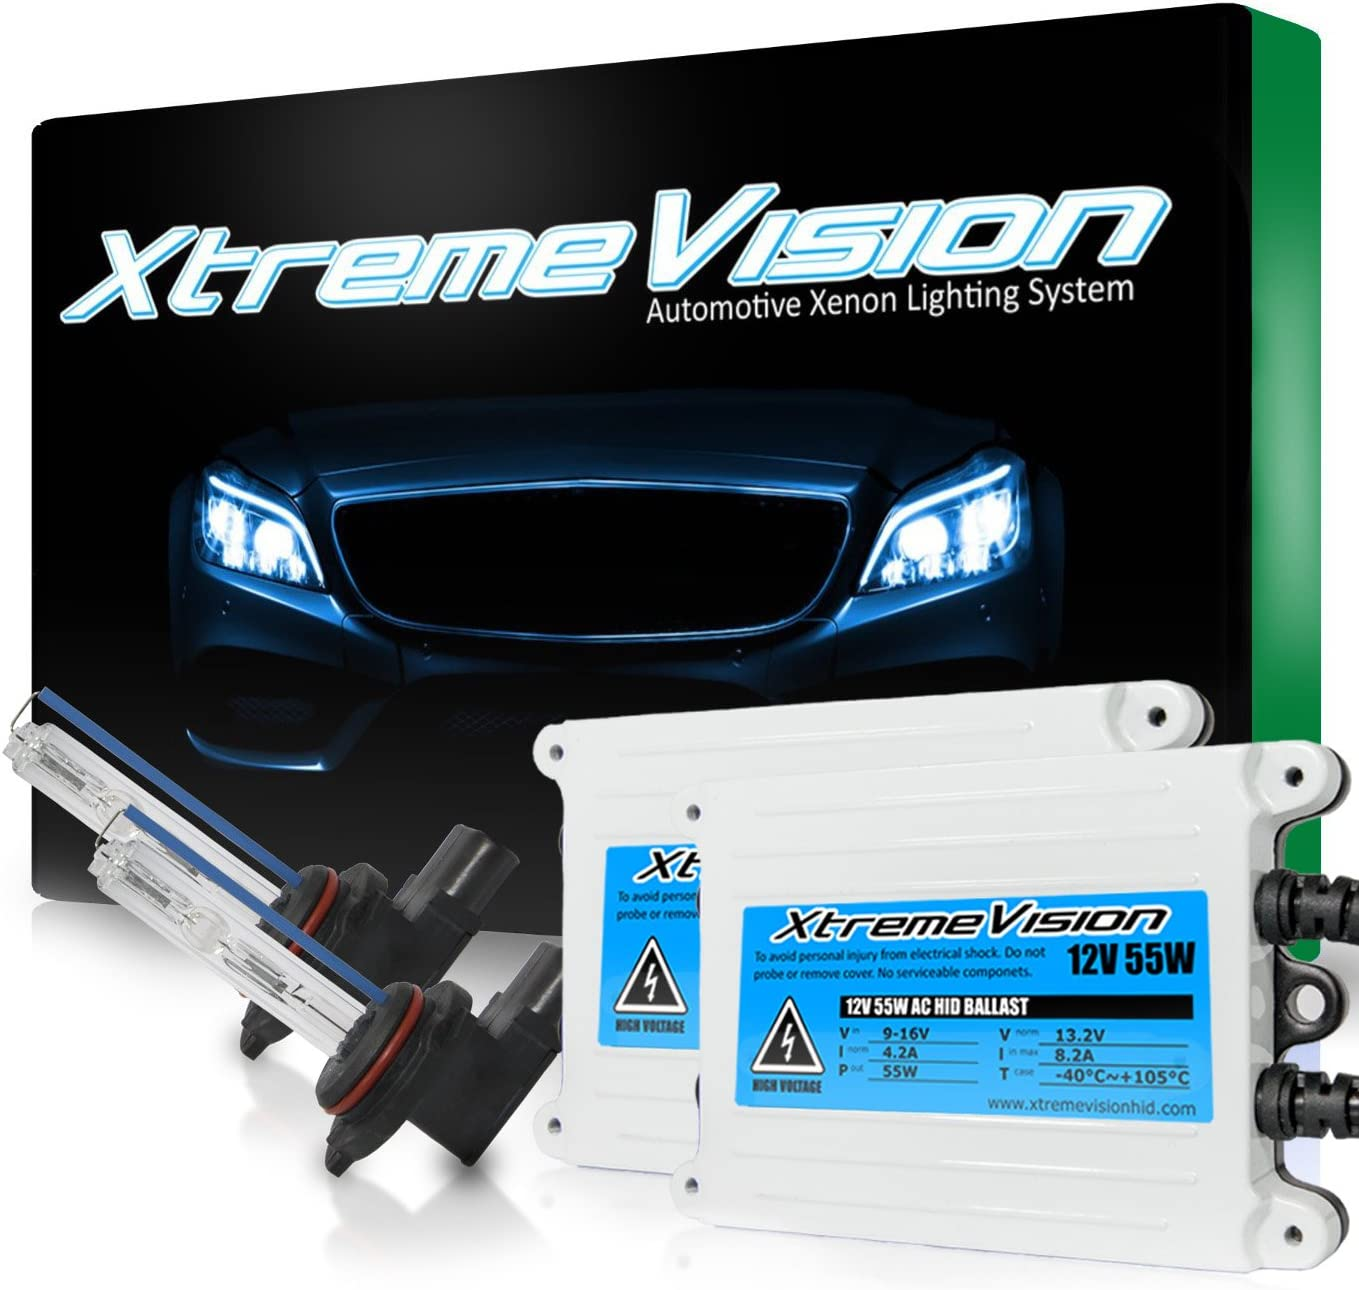 2 Year Warranty 9012 5000K XtremeVision 35W Xenon HID Lights with Premium Slim Ballast 5K Bright White